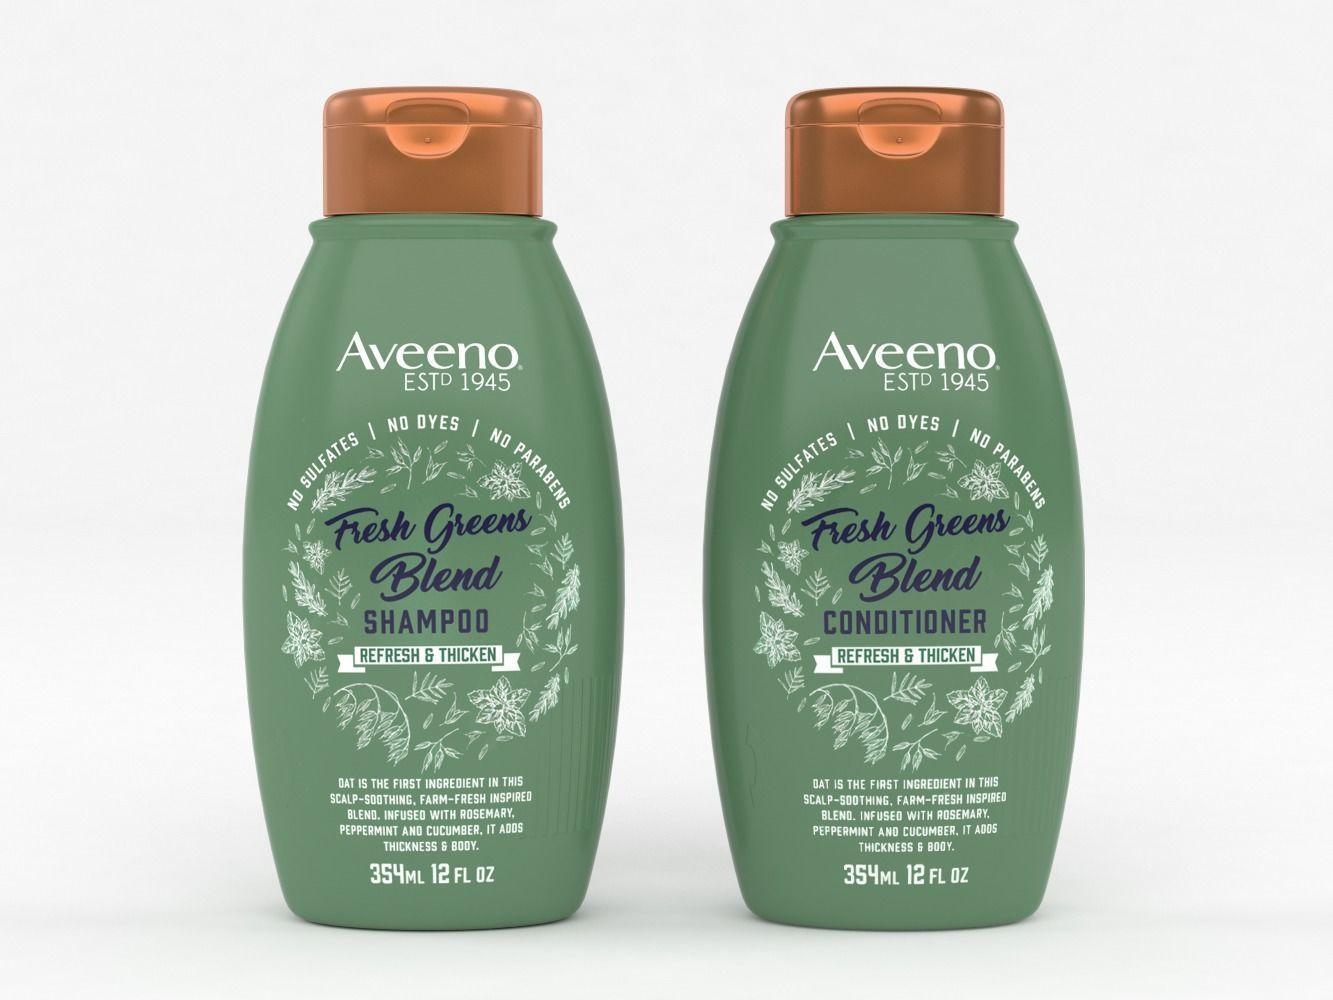 Aveeno Fresh Greens Blend Shampoo and Conditioner